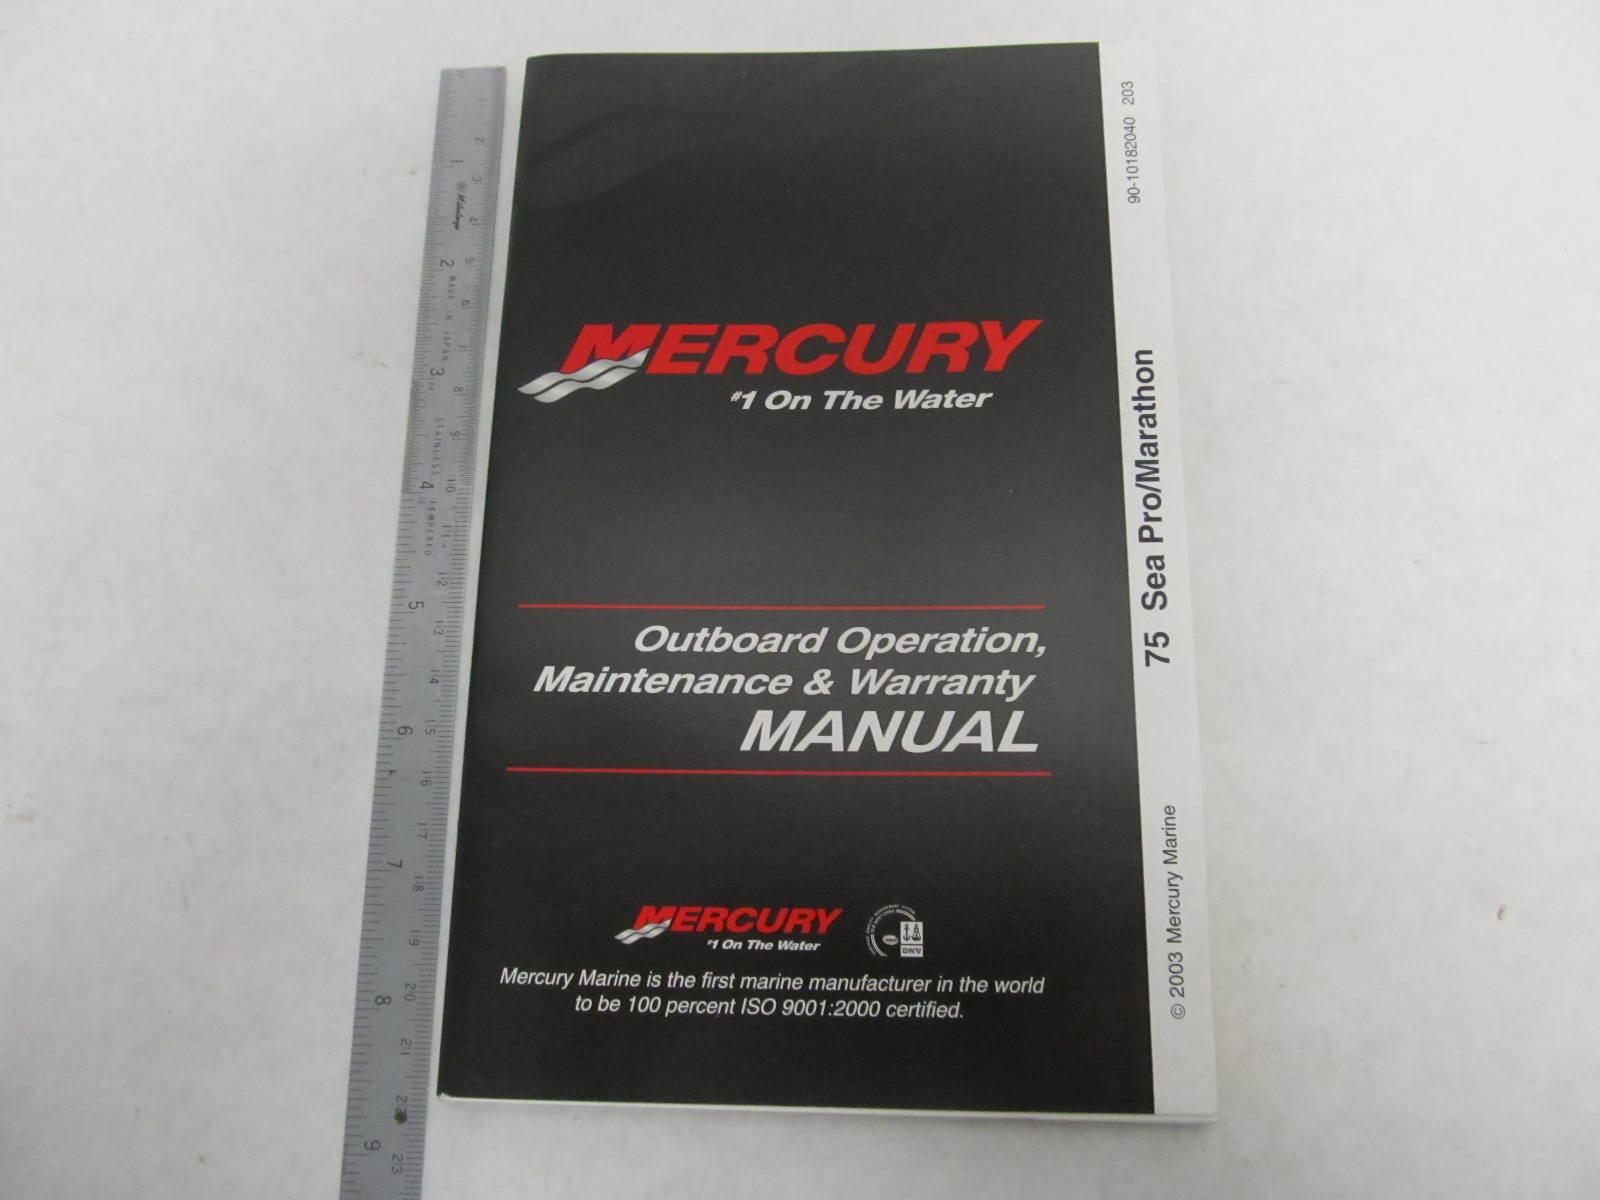 2003 mercury 75 hp outboard manual